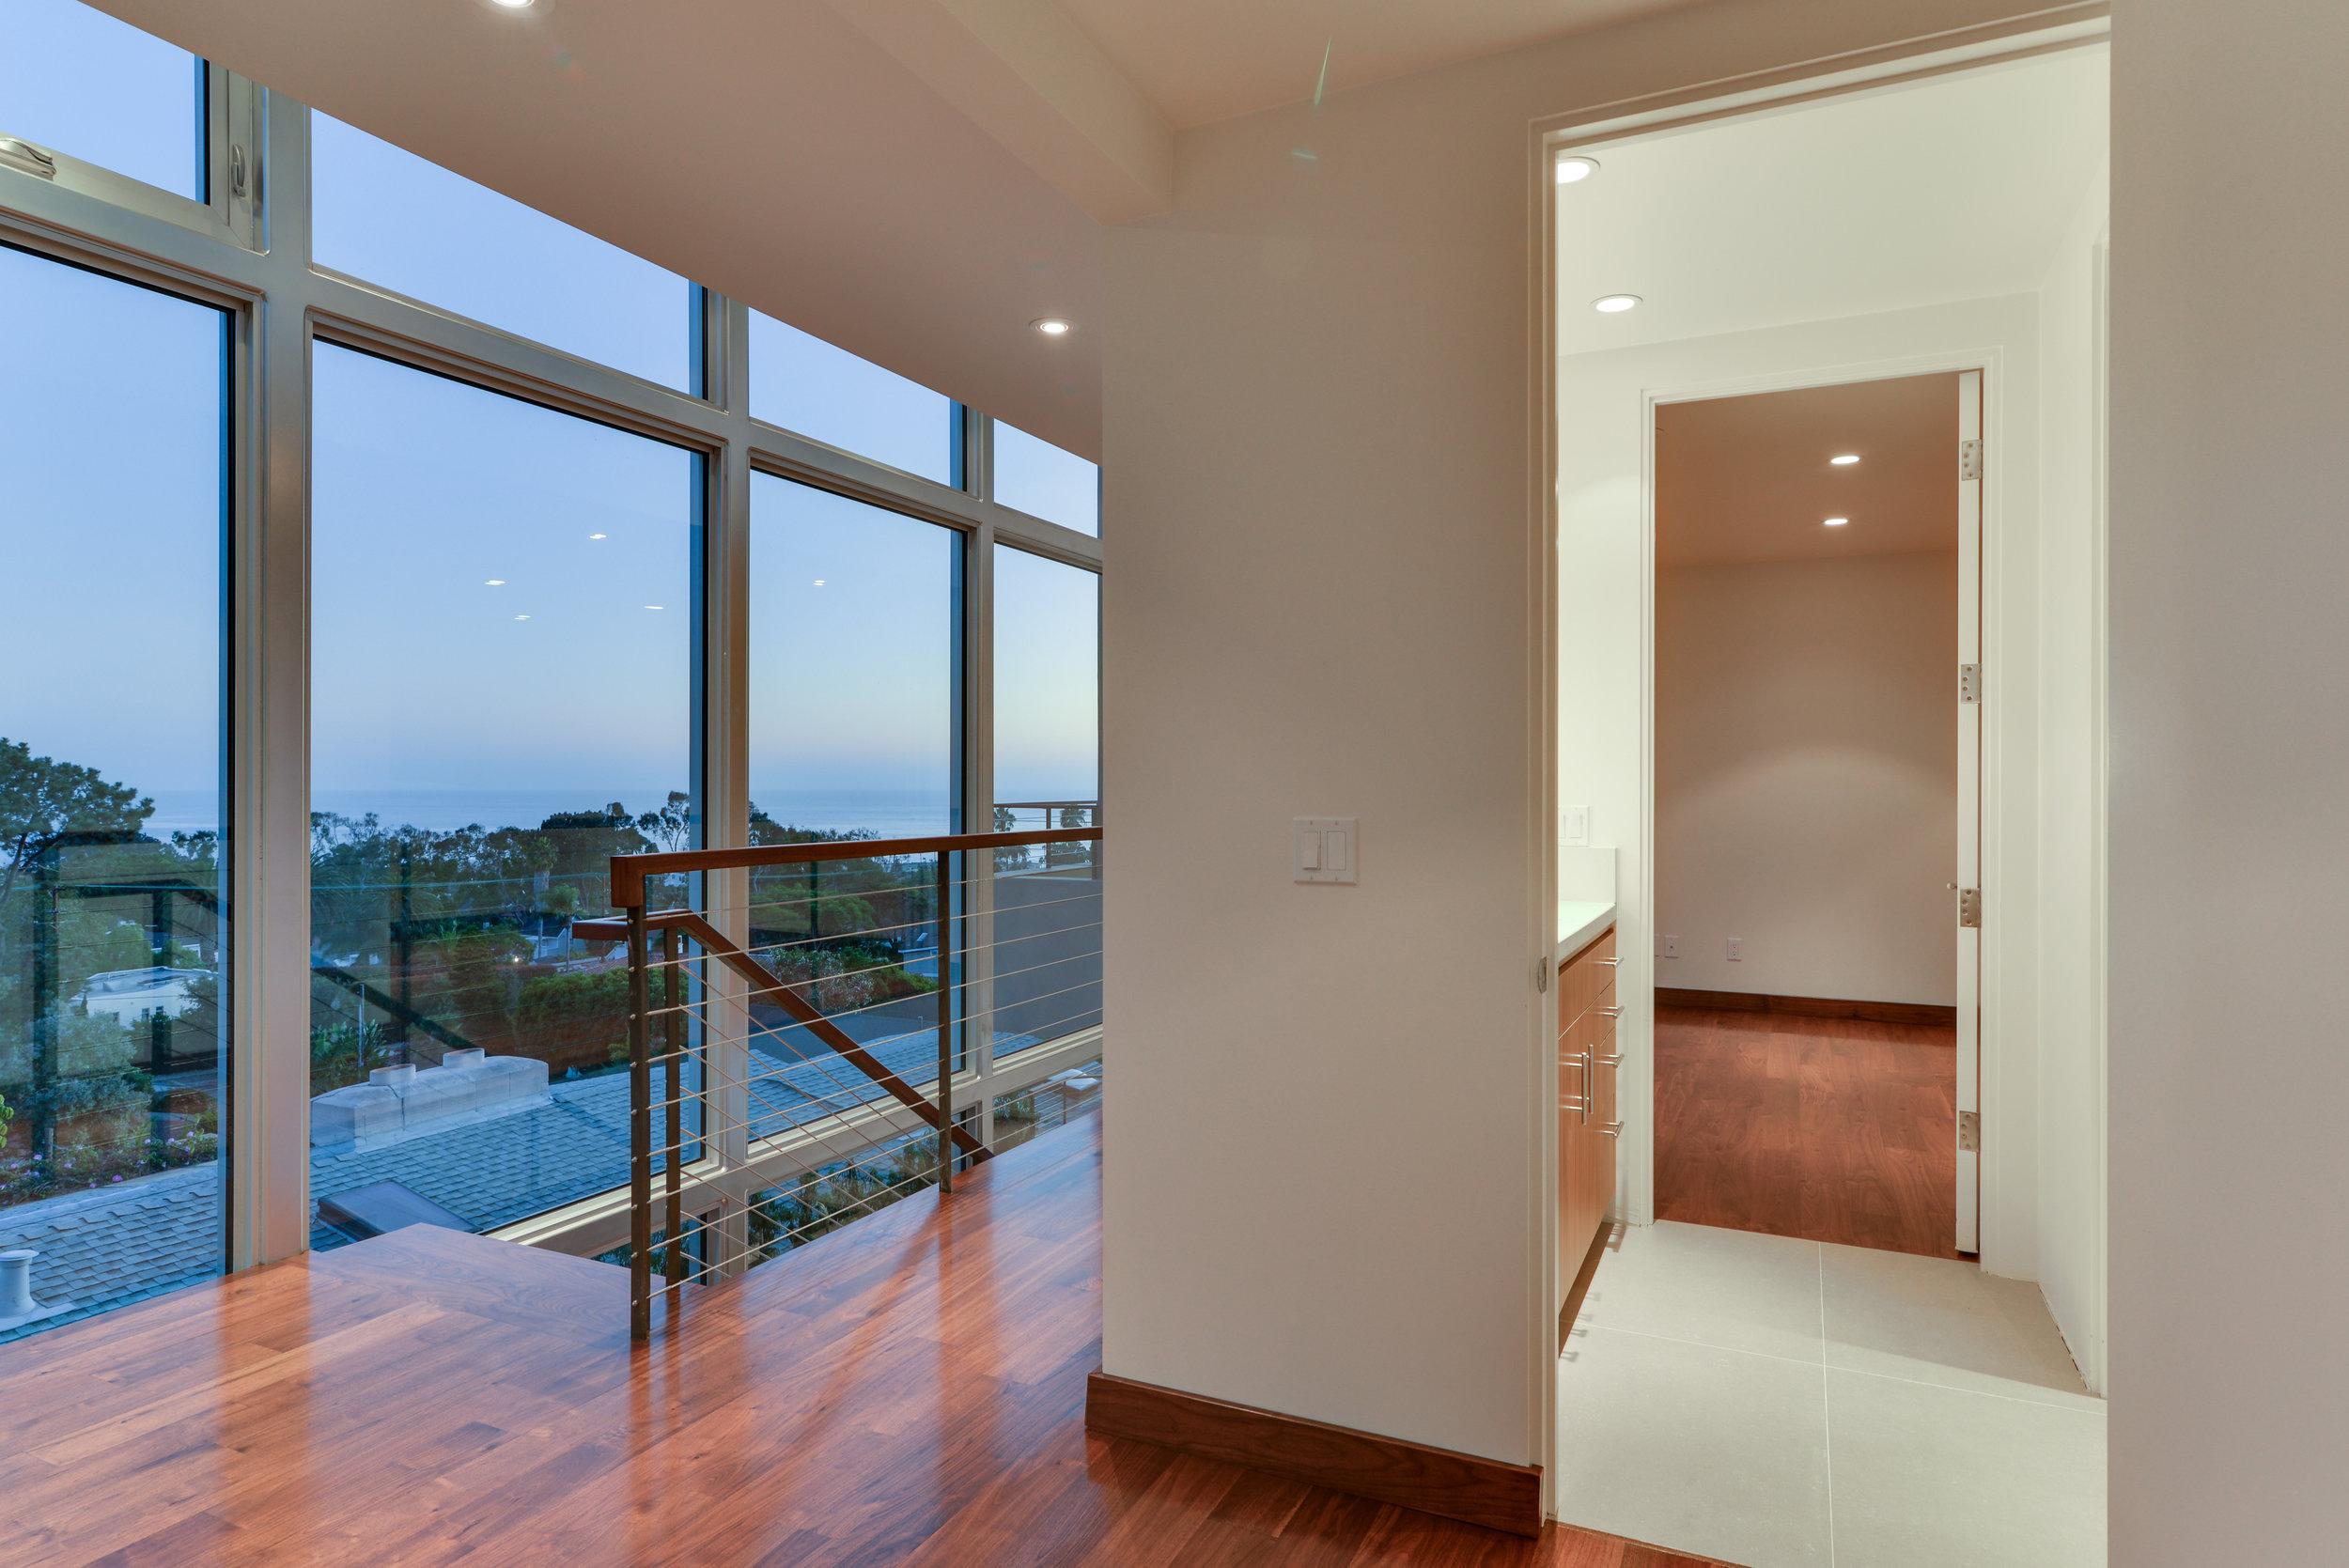 S.E.A.-Studio-Environmental-Architecture-David-Hertz-FAIA-Linda-Rosa-House-La-Jolla-San-Diego-sustainable-regenerative-restorative-design-modern-residential-mindful-garden-panoramic-ocean-view-open-concept-california-dream-13.jpg